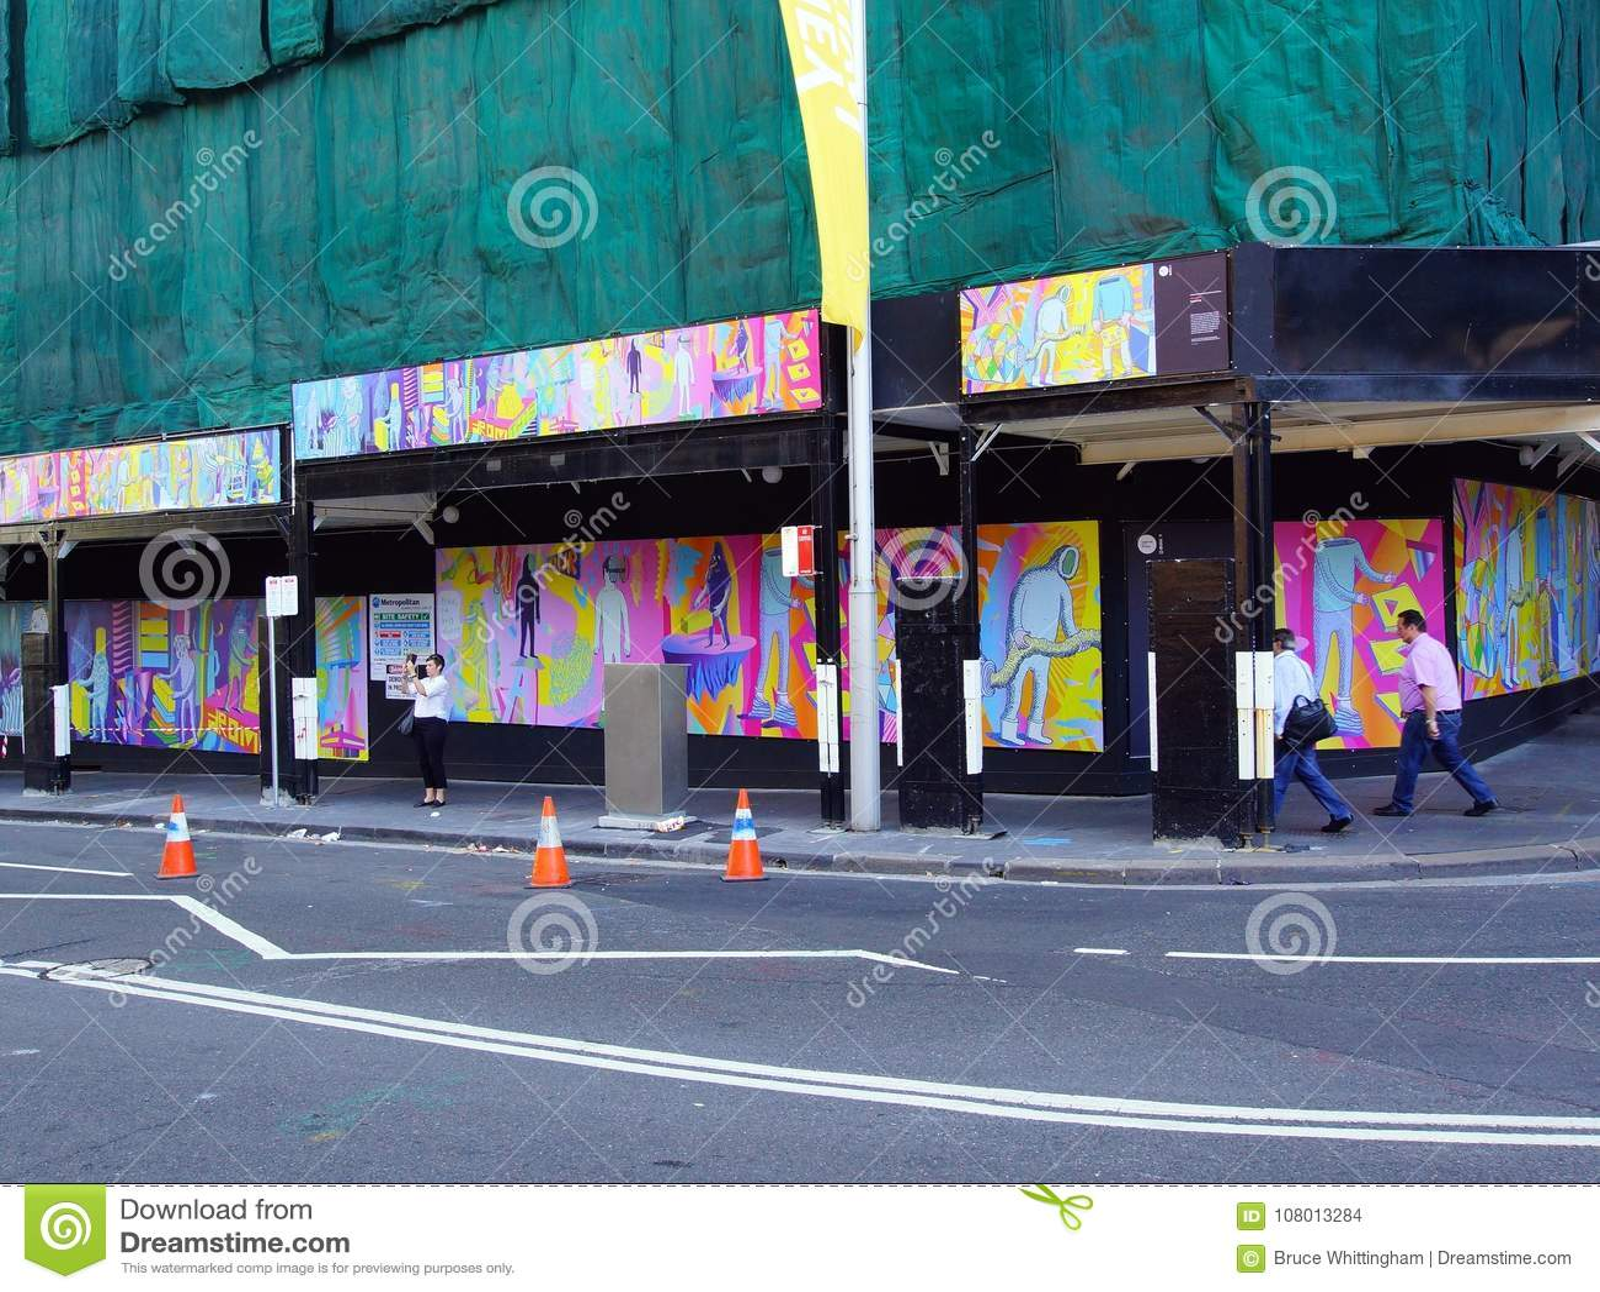 Building Site Graffiti, Sydney CBD, Australia Editorial